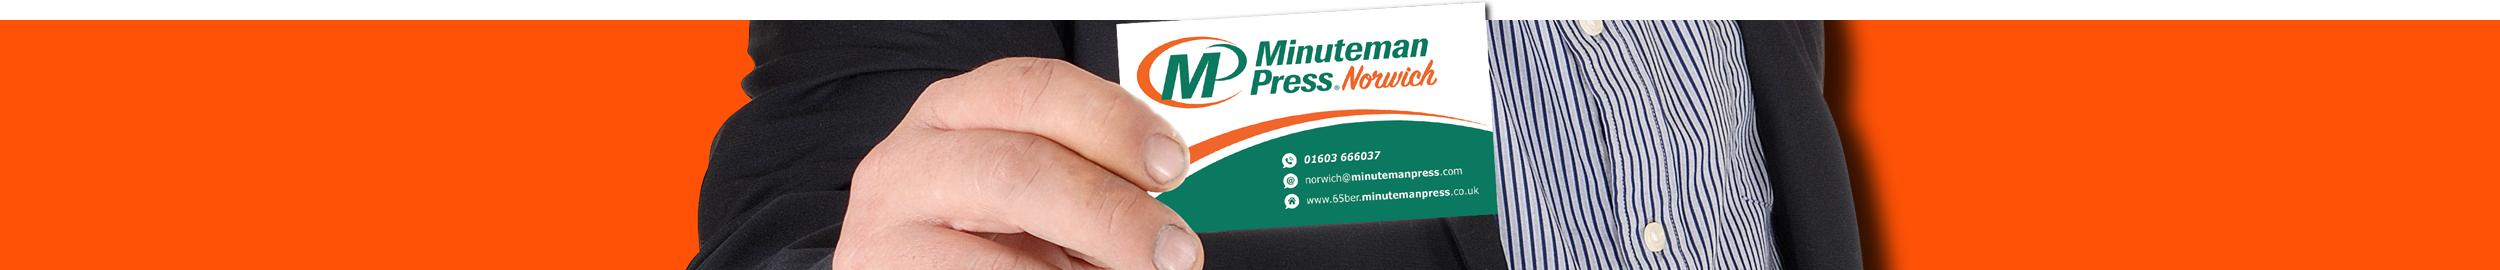 Business Cards Banner | Minuteman Press Norwich